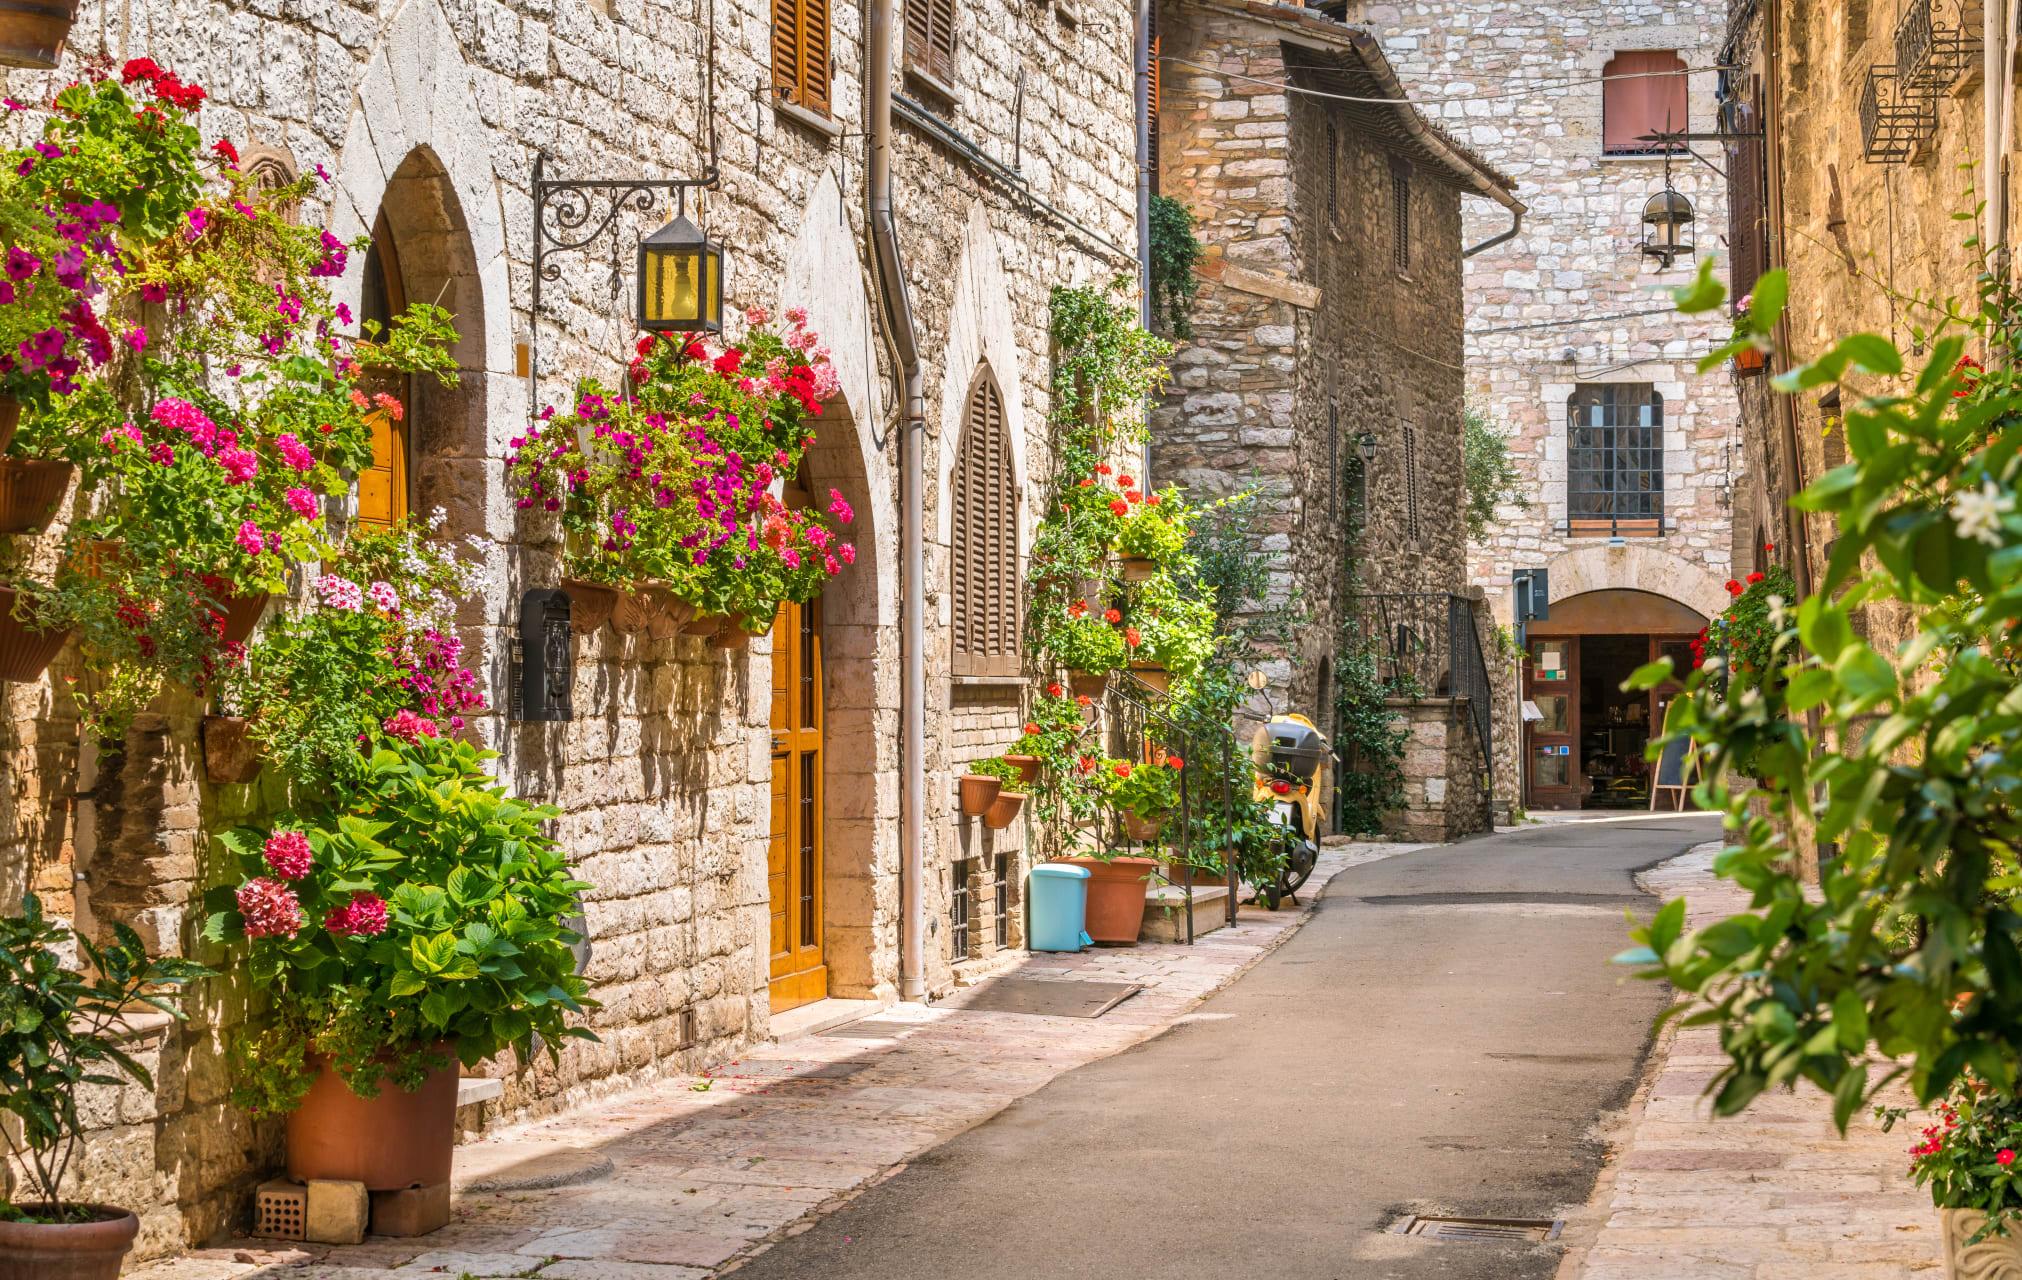 Assisi - District of San Rufino